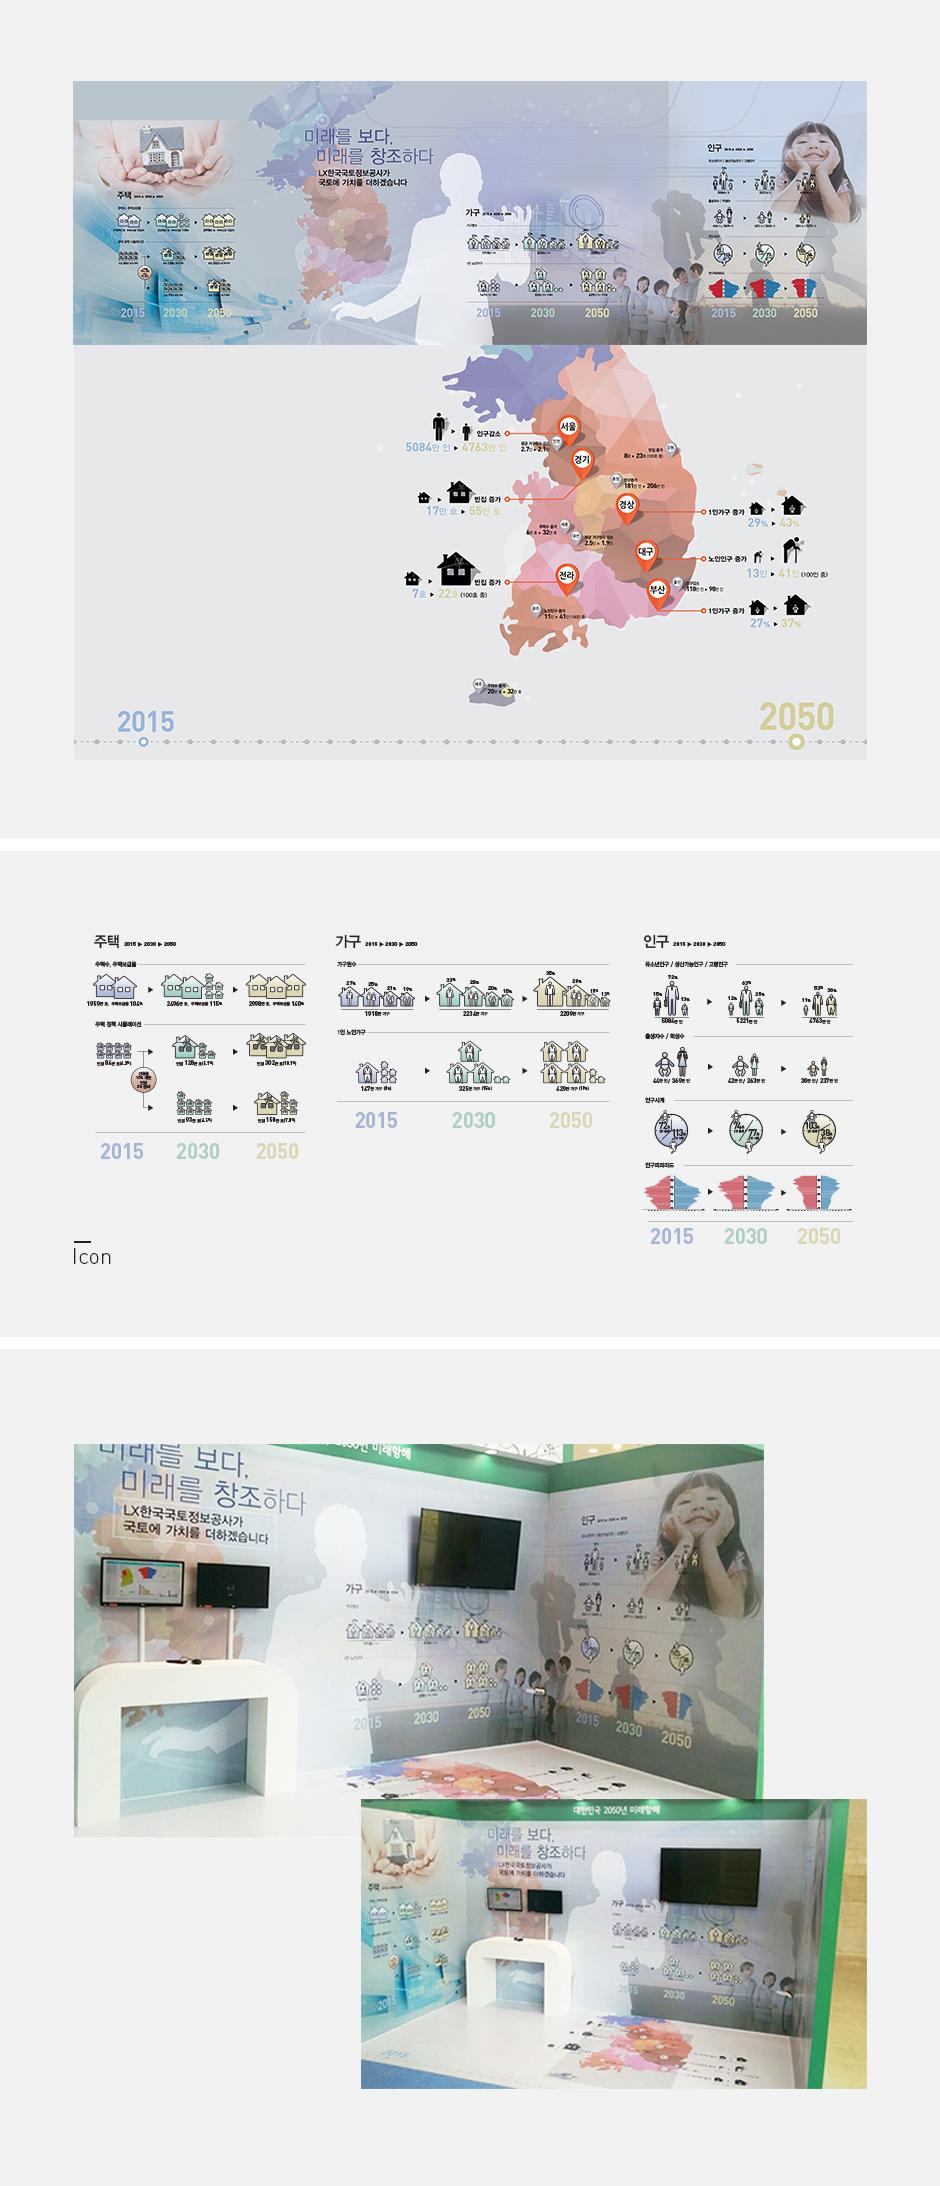 2016_ LX한국국토정보공사_2050 대한민국 미래보고서 부스 디자인